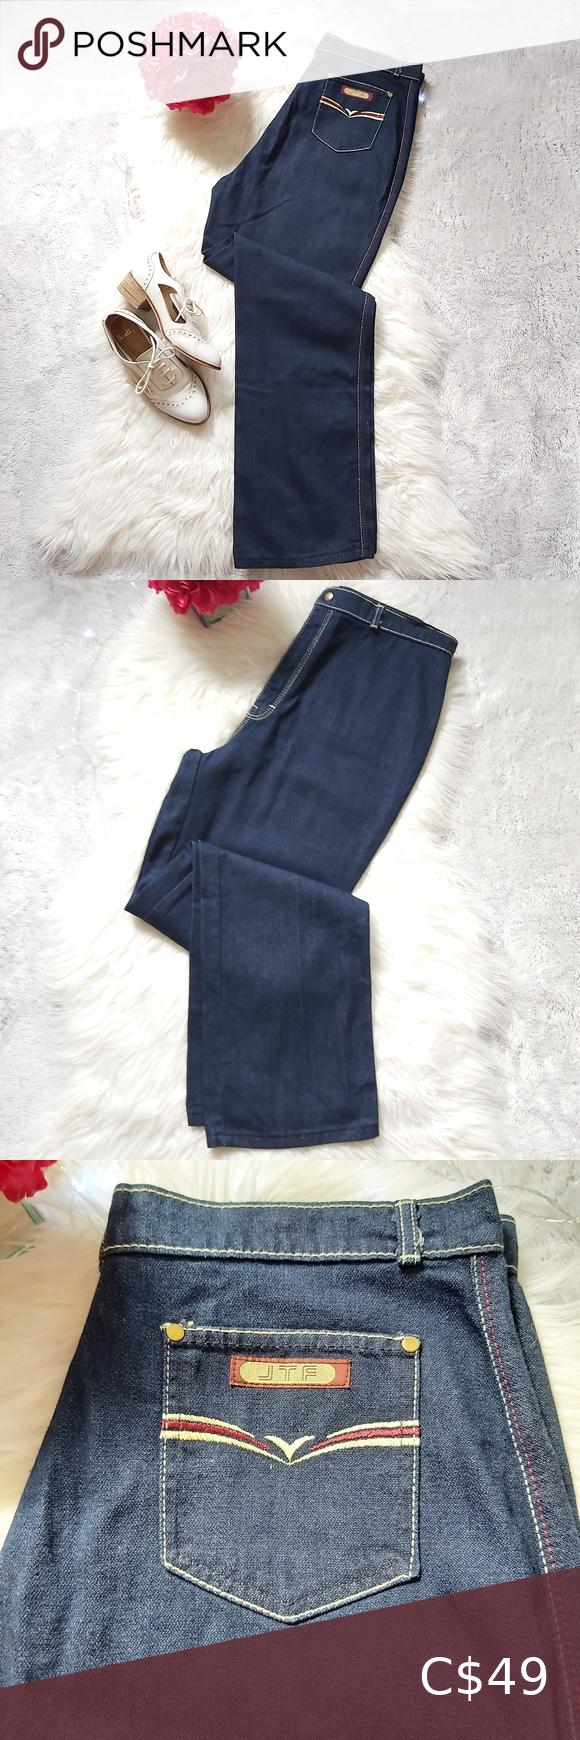 Dark Wash Vintage High Waisted Jeans PRICE DROP